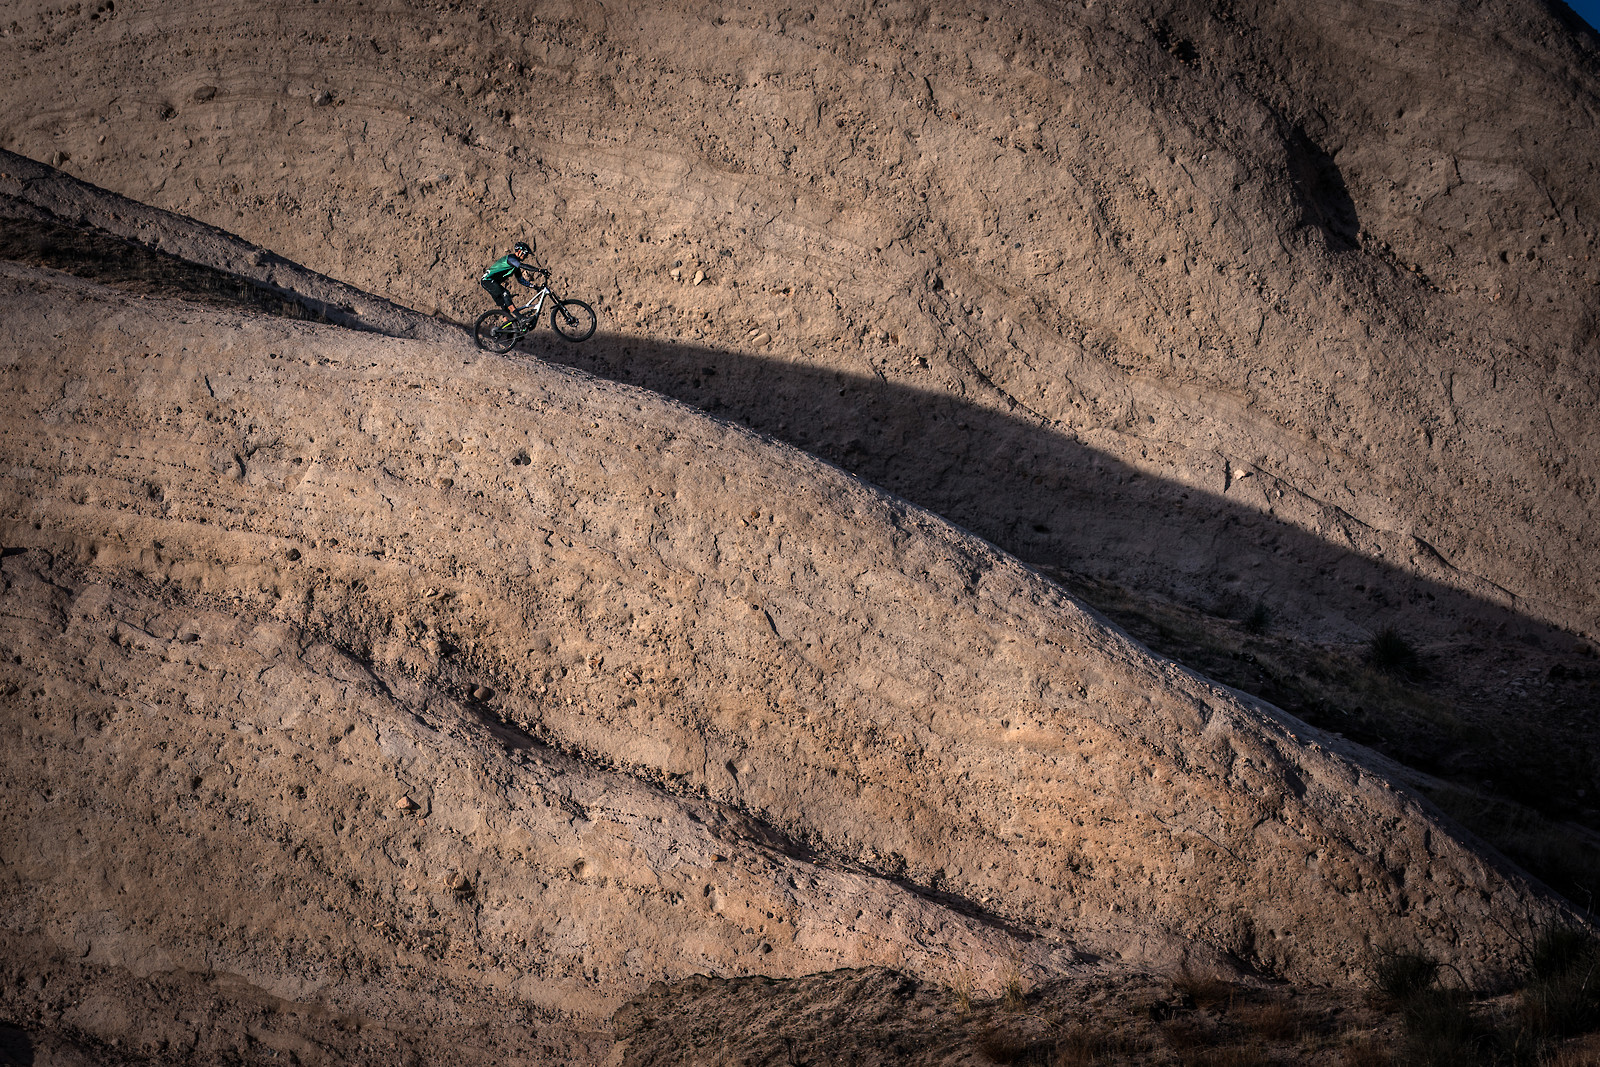 On the Edge - shreddyshots - Mountain Biking Pictures - Vital MTB